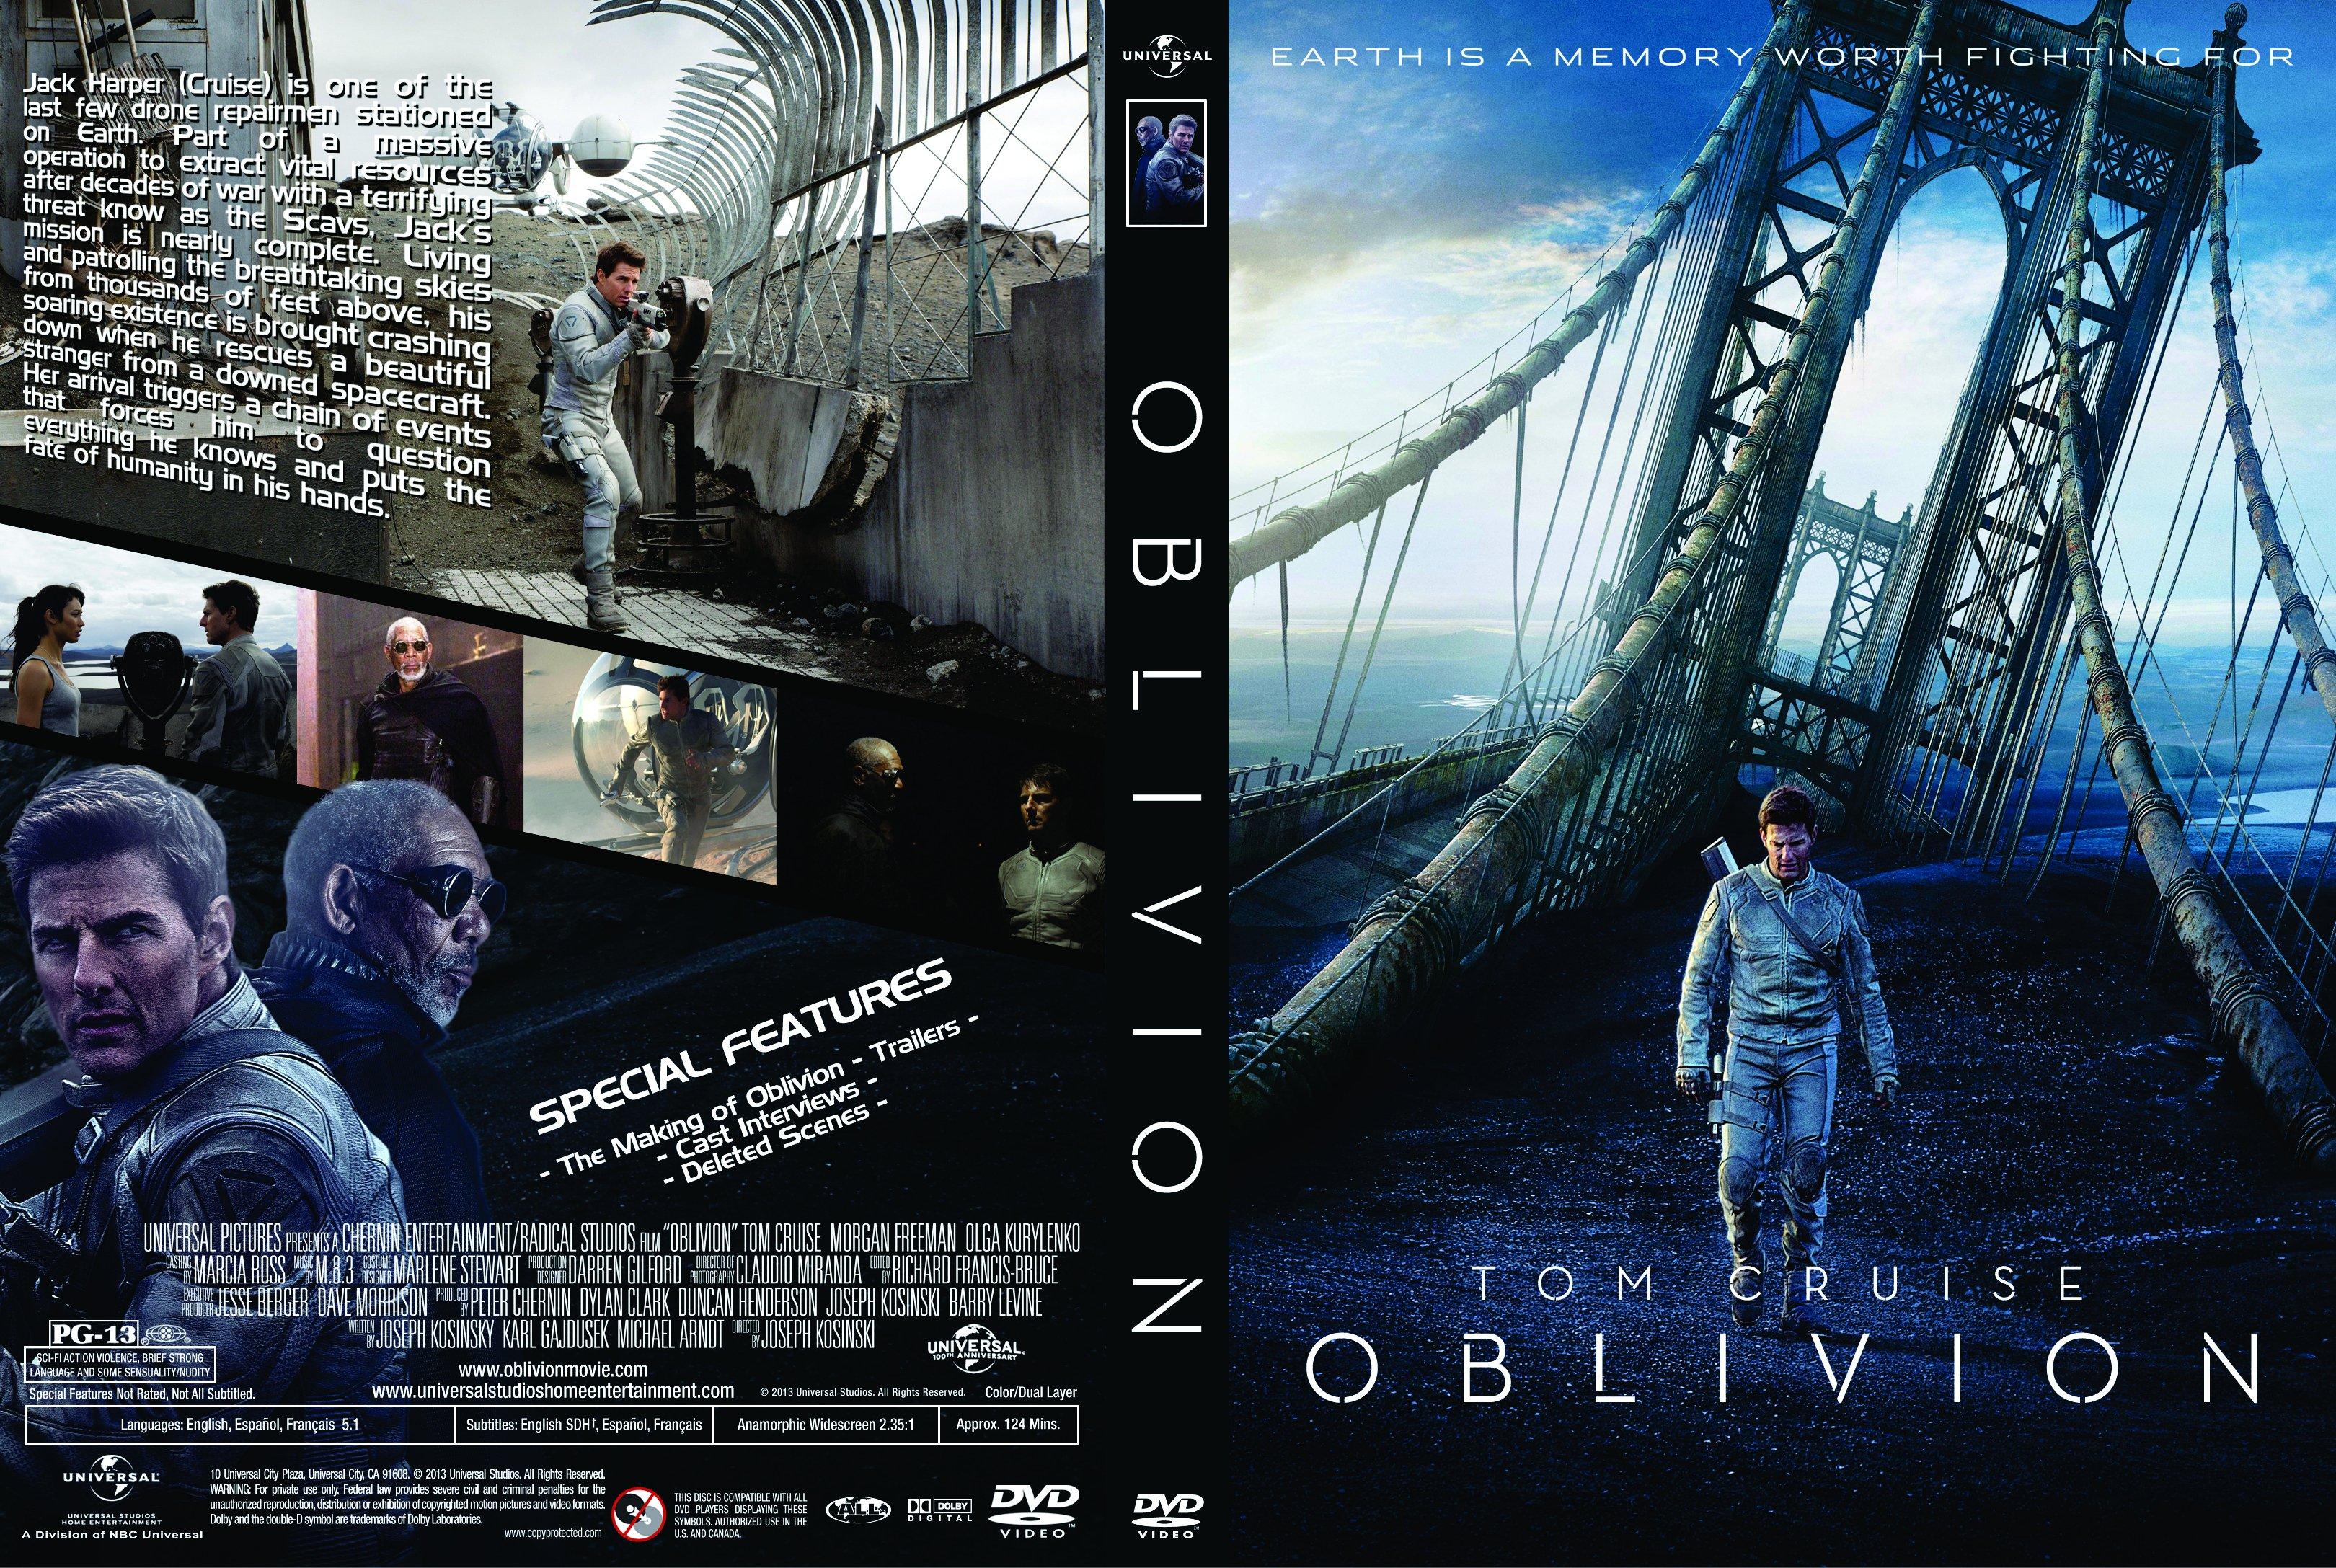 Oblivion Sound Track